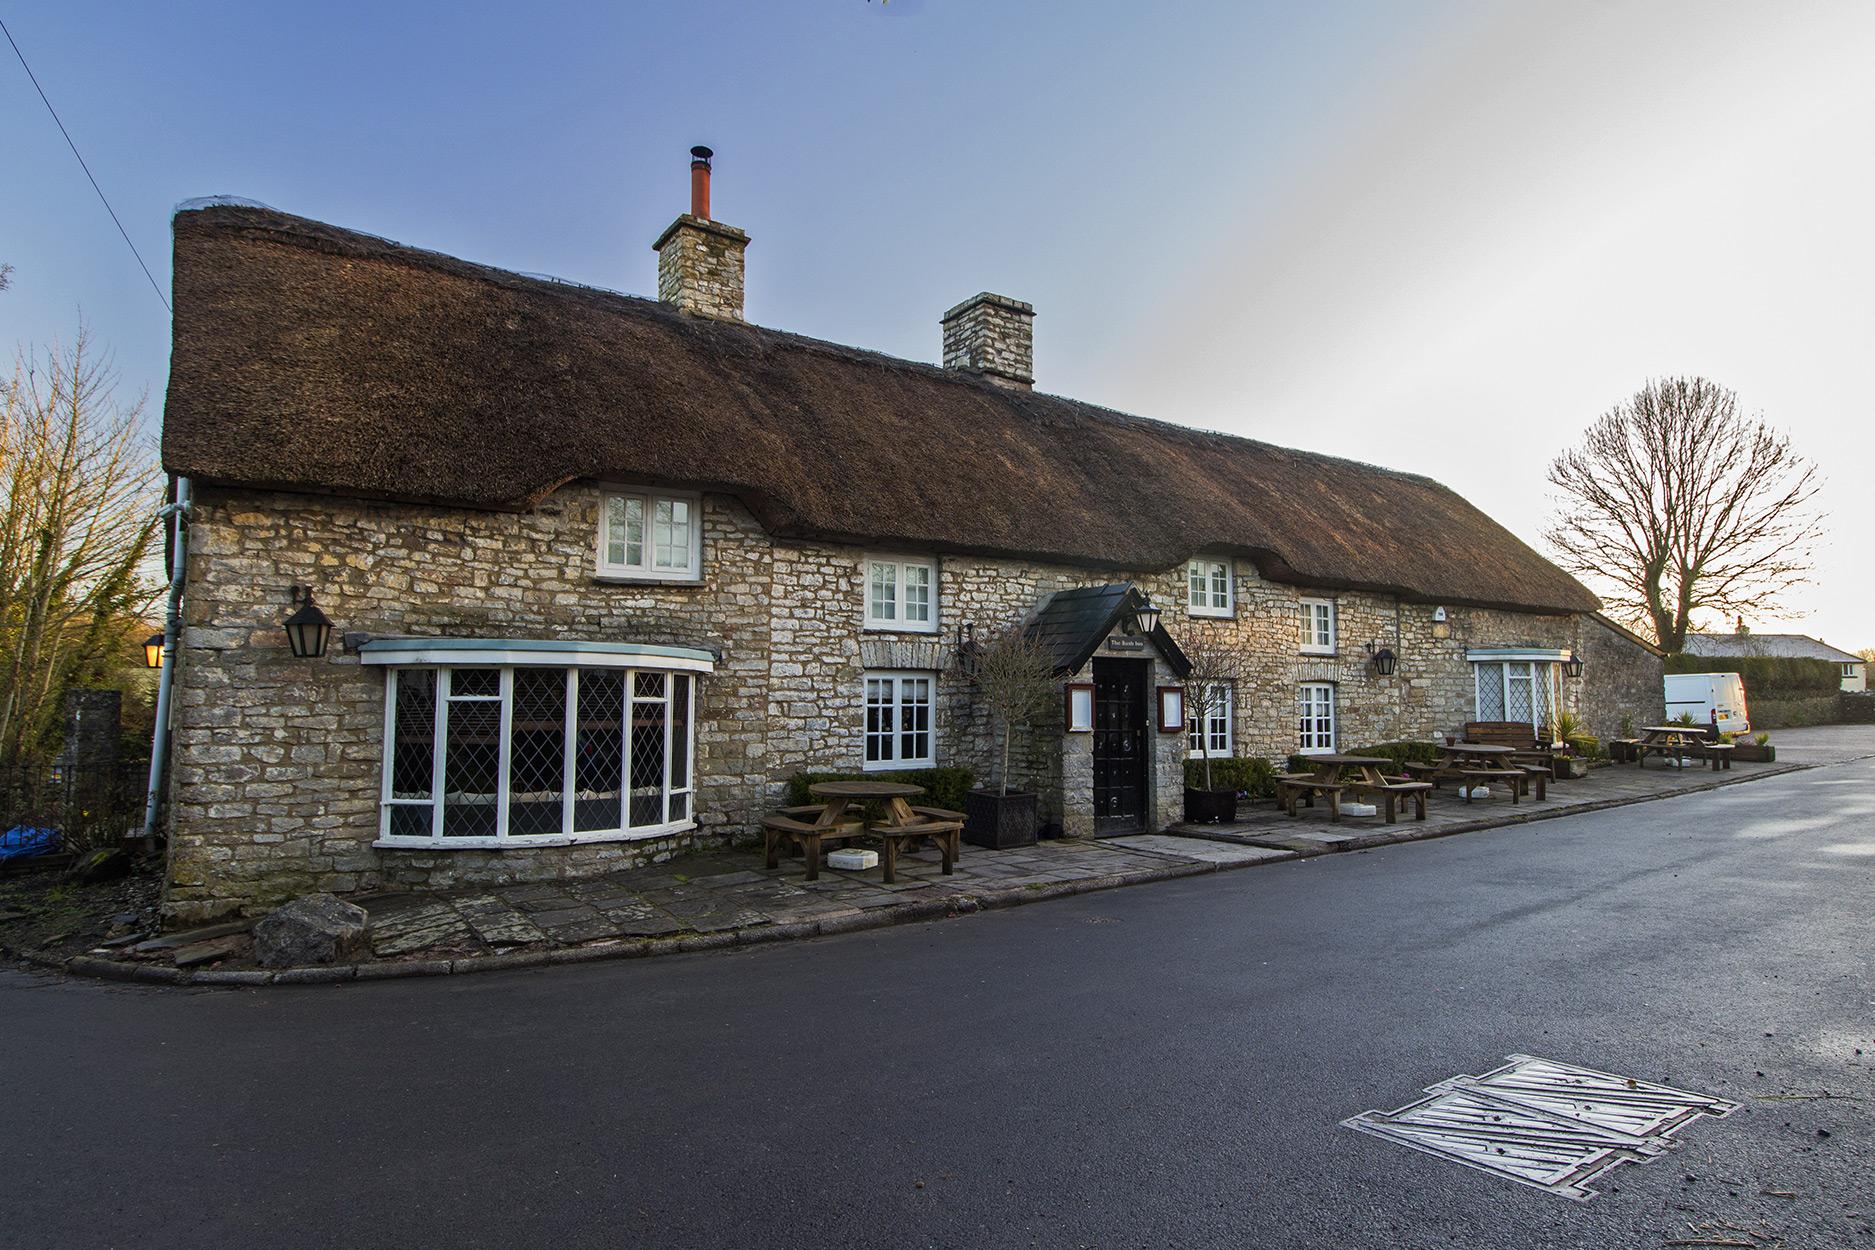 The Bush Inn Pub, Vale of Glamorgan